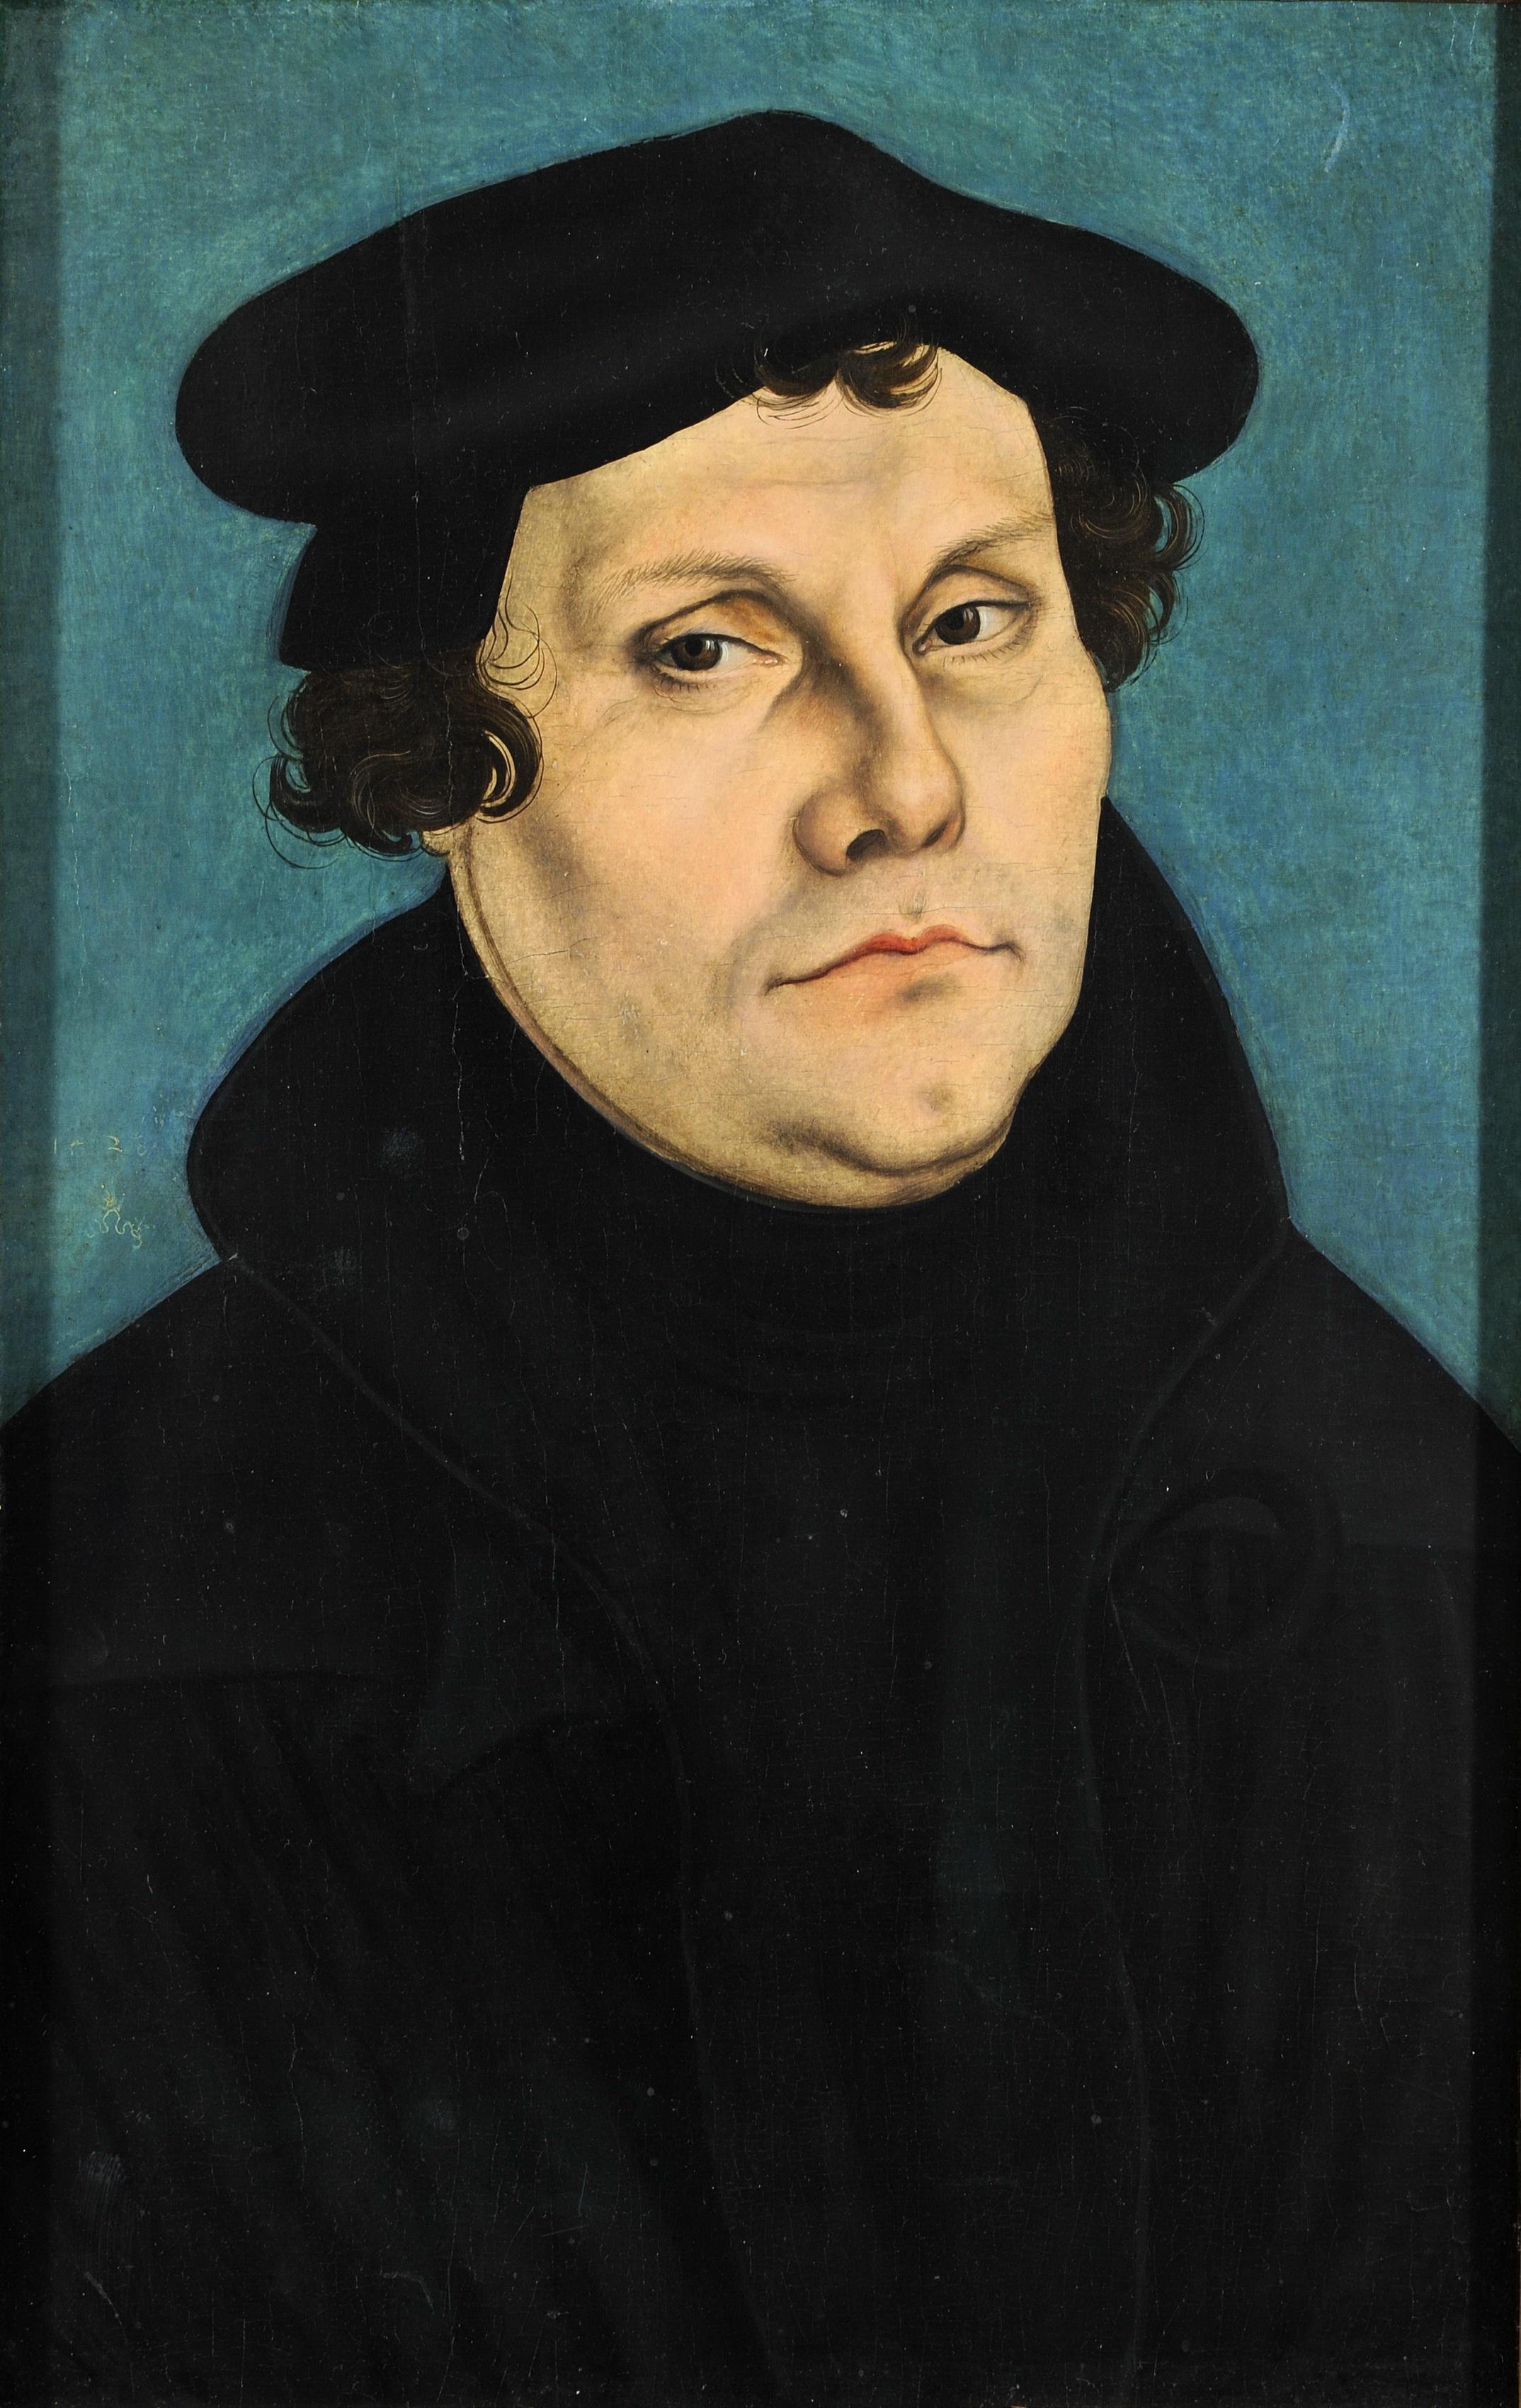 http://upload.wikimedia.org/wikipedia/commons/9/90/Lucas_Cranach_d.%C3%84._-_Martin_Luther,_1528_(Veste_Coburg).jpg